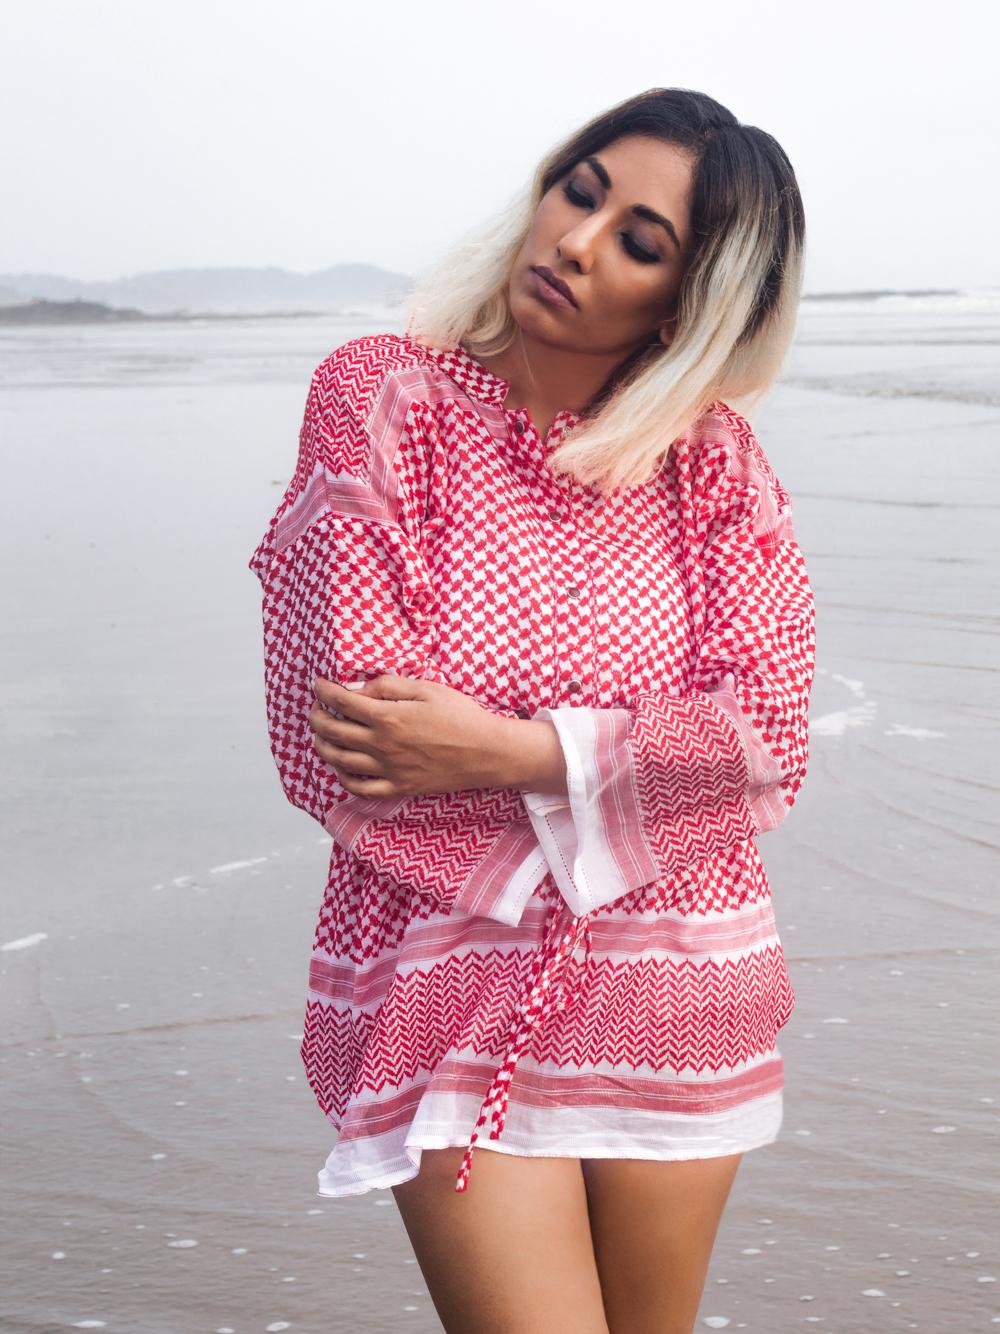 Morjim Beach ; Goa Fashion ; Monsoon Look ; Boho ; Goa ;Travel ; Beach Editorial ; Monsoon Beach ; By the Ocean ; Bohemian Fashion ; Slow living ;photography ; Dark ; Goan ; Evening Light ; Naznin ; Naznin Suhaer ; indian blogger ; hyderabad fashion bloggers ; hyderabad bloggers ; hyderabad fashion blogger ; I Dress for the Applause ;Hyderabad ;